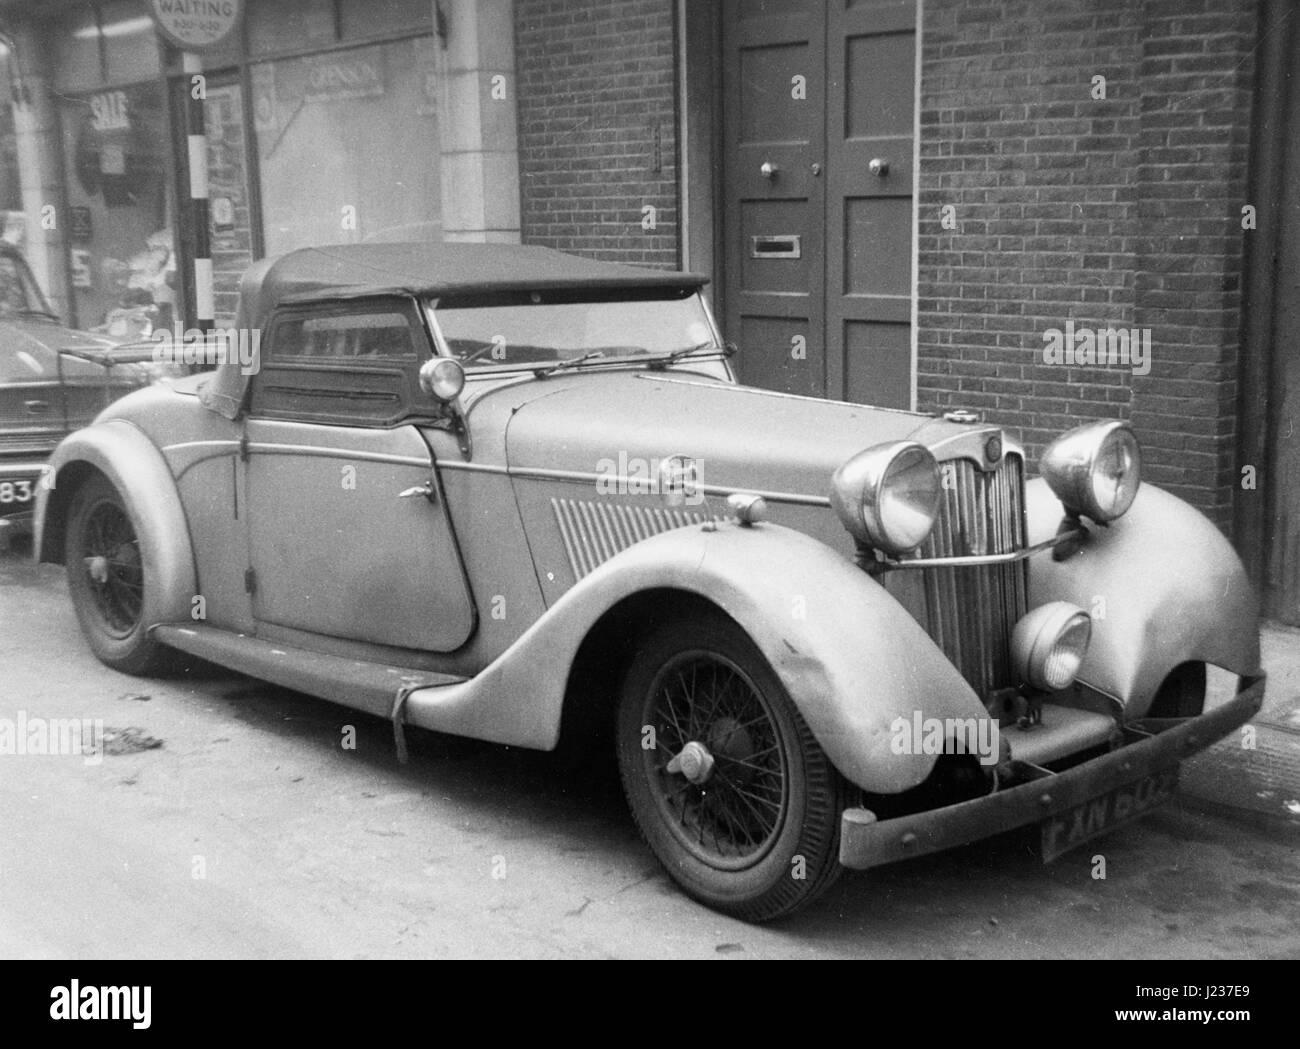 1939 Lea-Francis 1.5 litre Corsica body roadster. - Stock Image